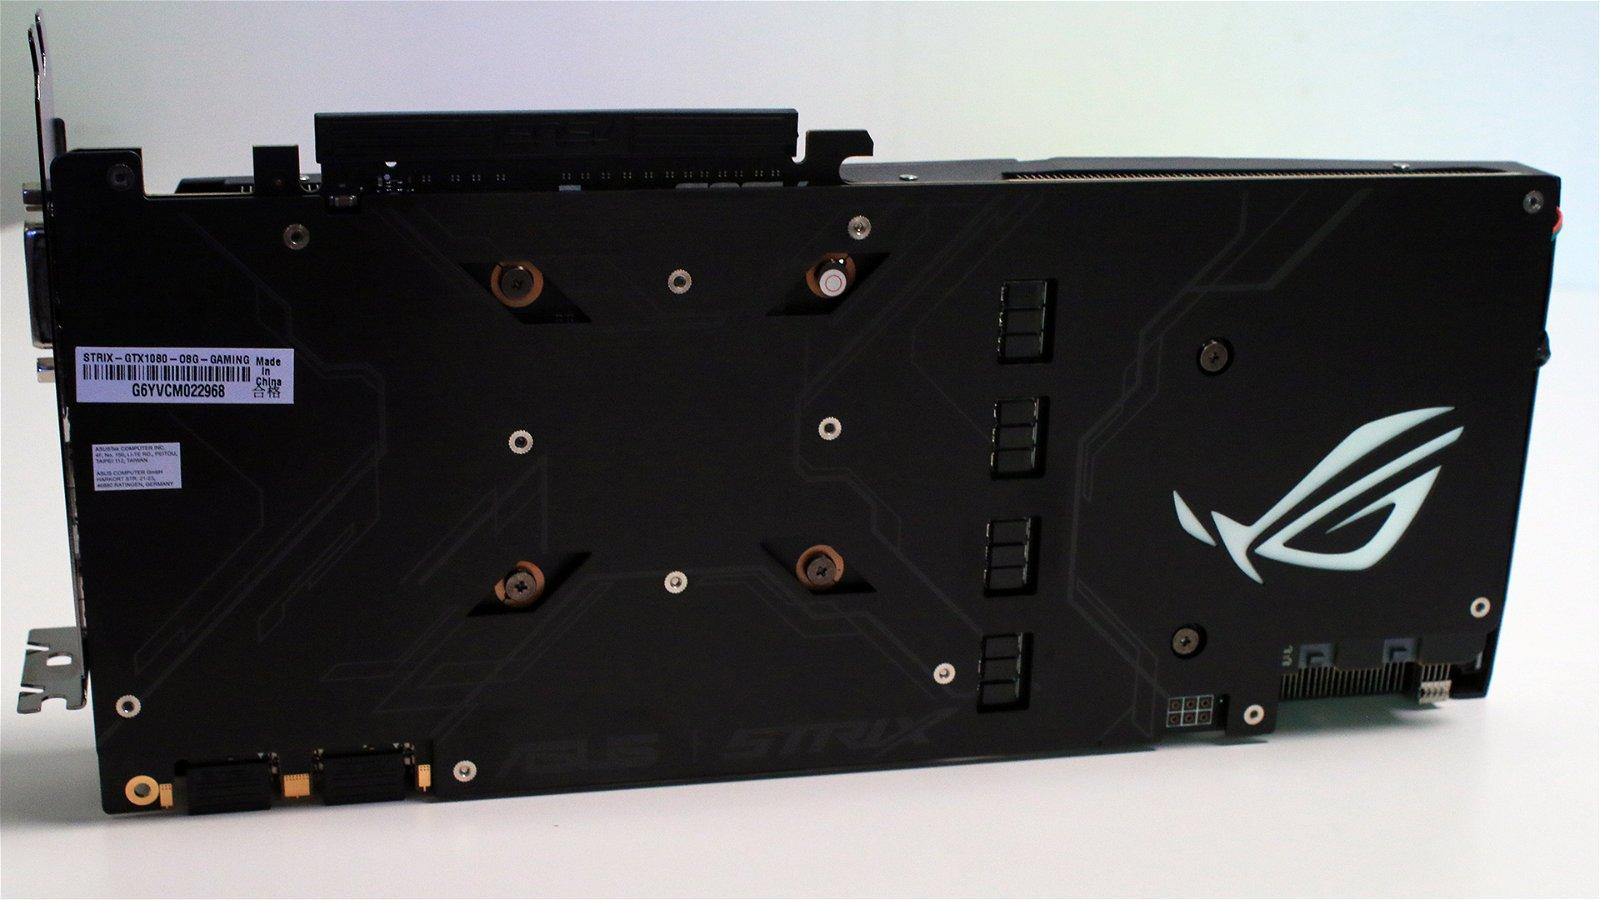 Nvidia Geforce Gtx 1080 Strix (Hardware) Review 5